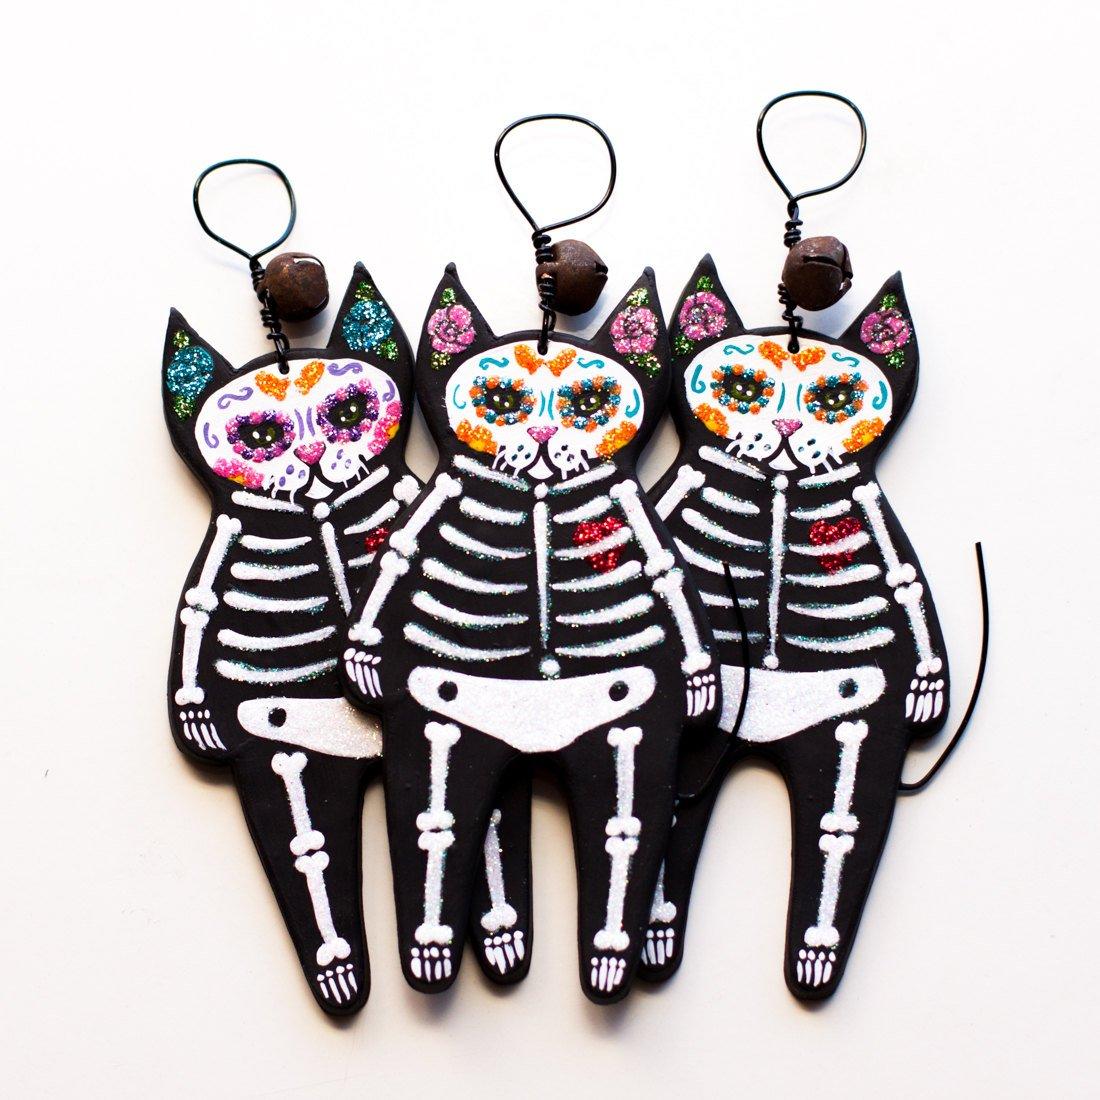 Day of the Dead Skeleton Cat Folk Art Clay Ornament